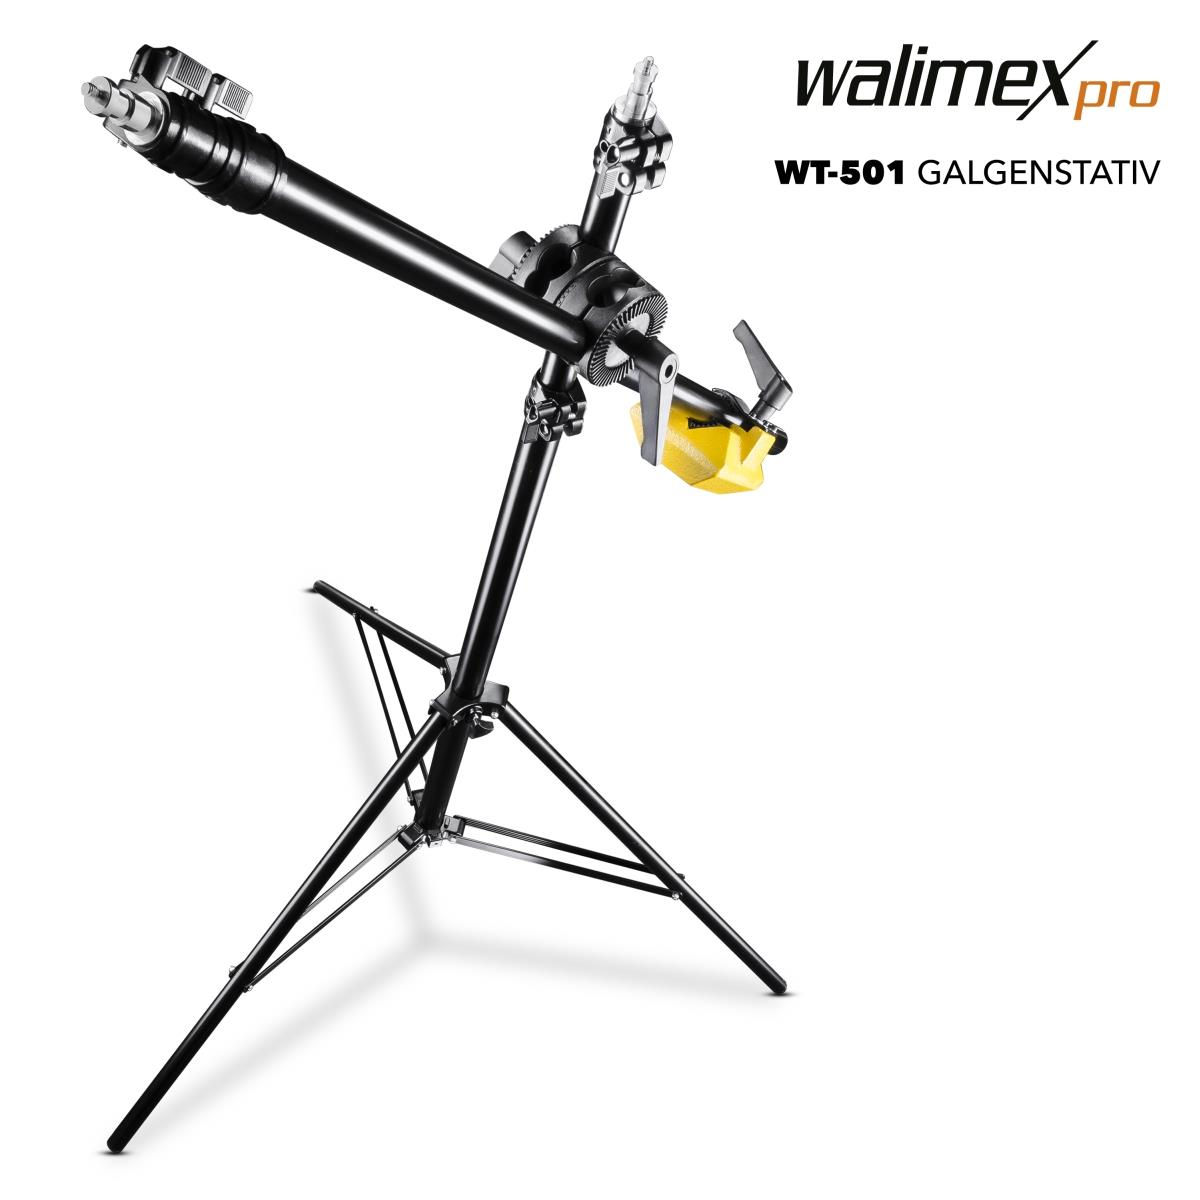 Walimex pro Galgenstativ WT-501 100-410cm 3-5kg